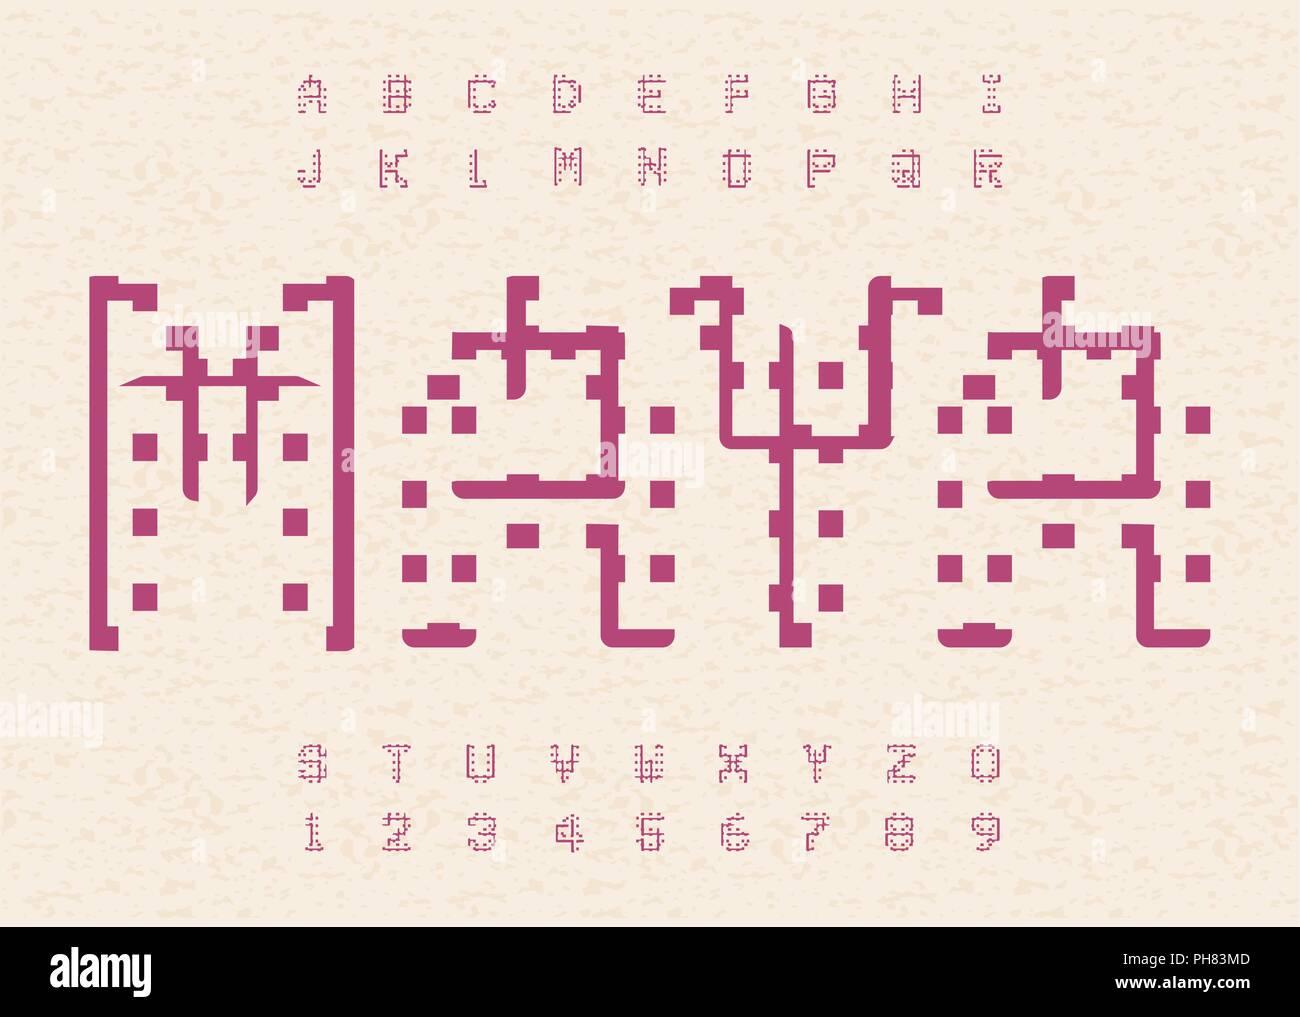 Hieroglyphic Alphabet Stock Photos Hieroglyphic Alphabet Stock